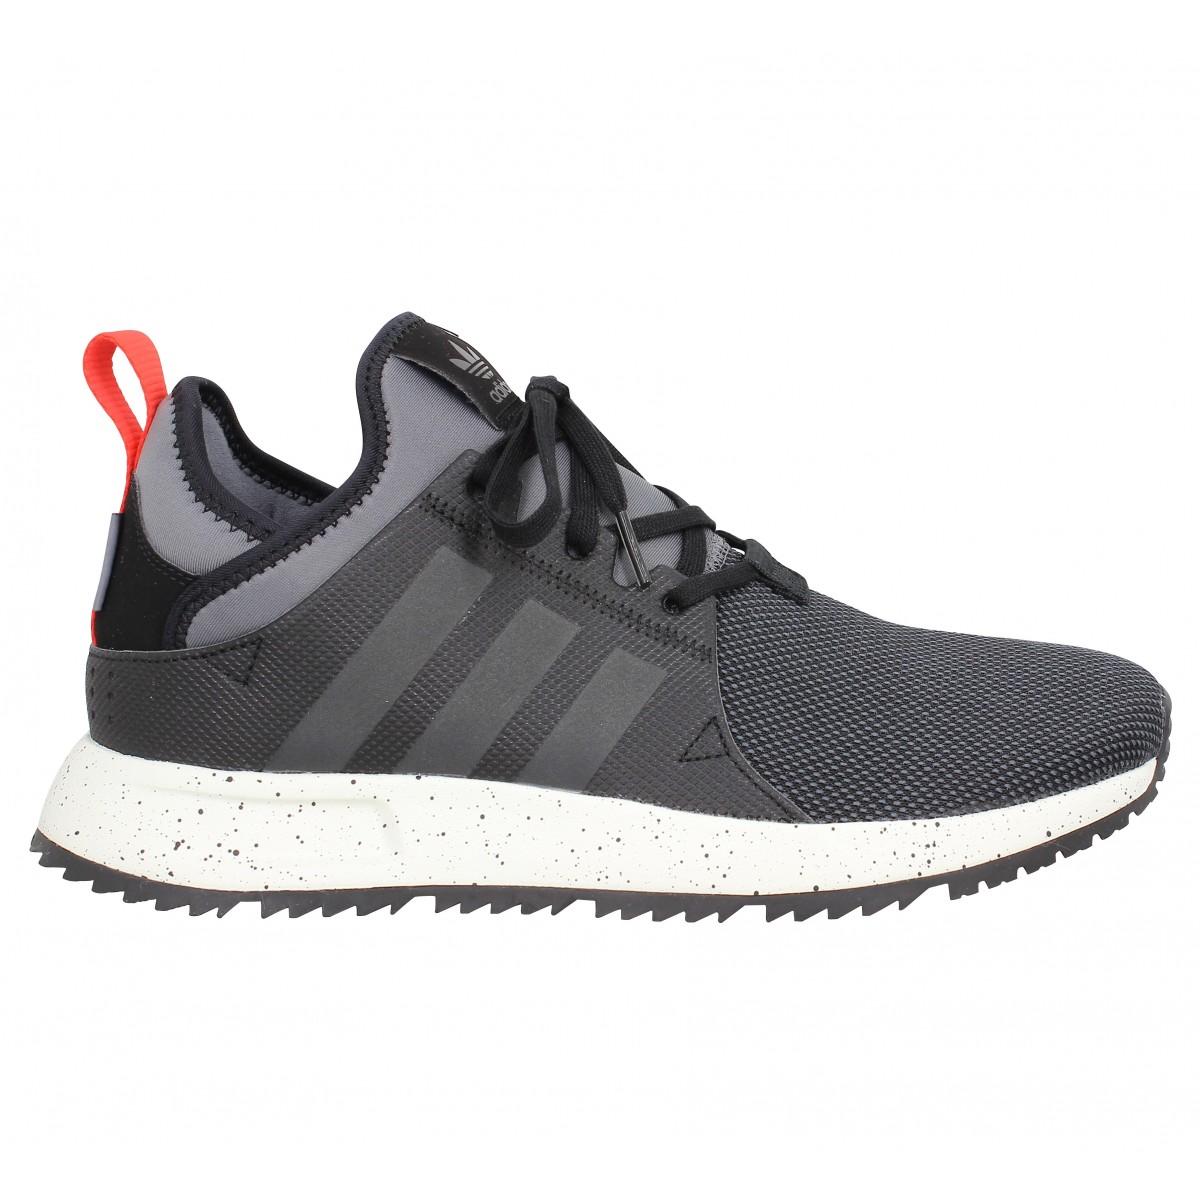 ADIDAS X PLR Sneaker Boot toile Homme Noir